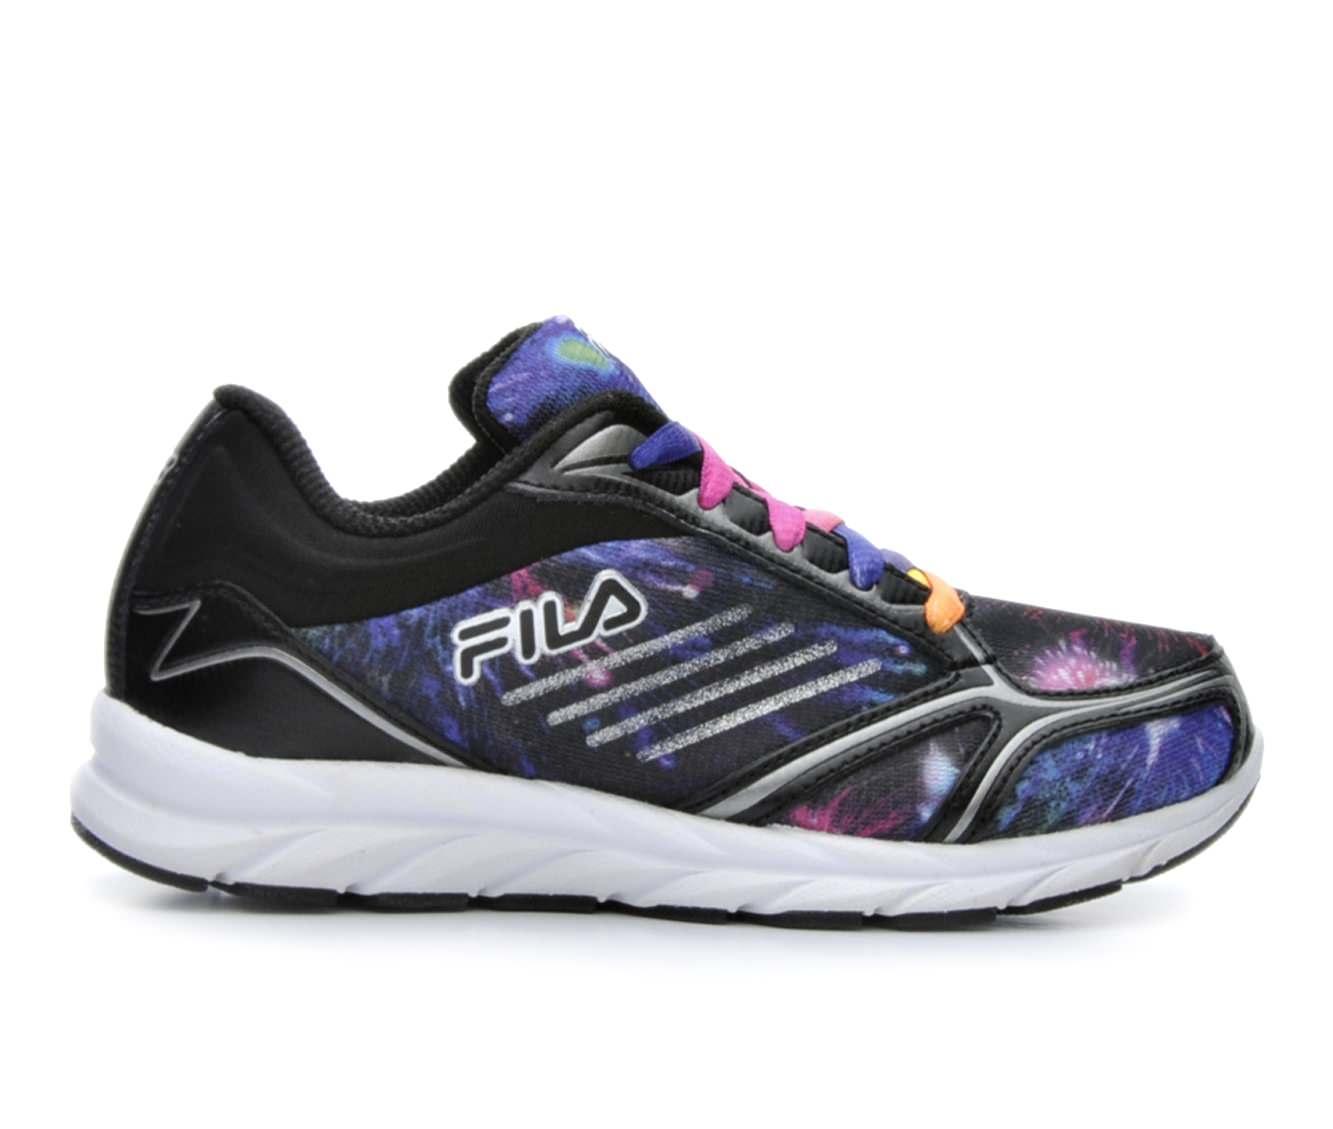 Girls' Fila Tempura 2 Running Shoes (Black - Size 10.5 - Little Kid) 1613063